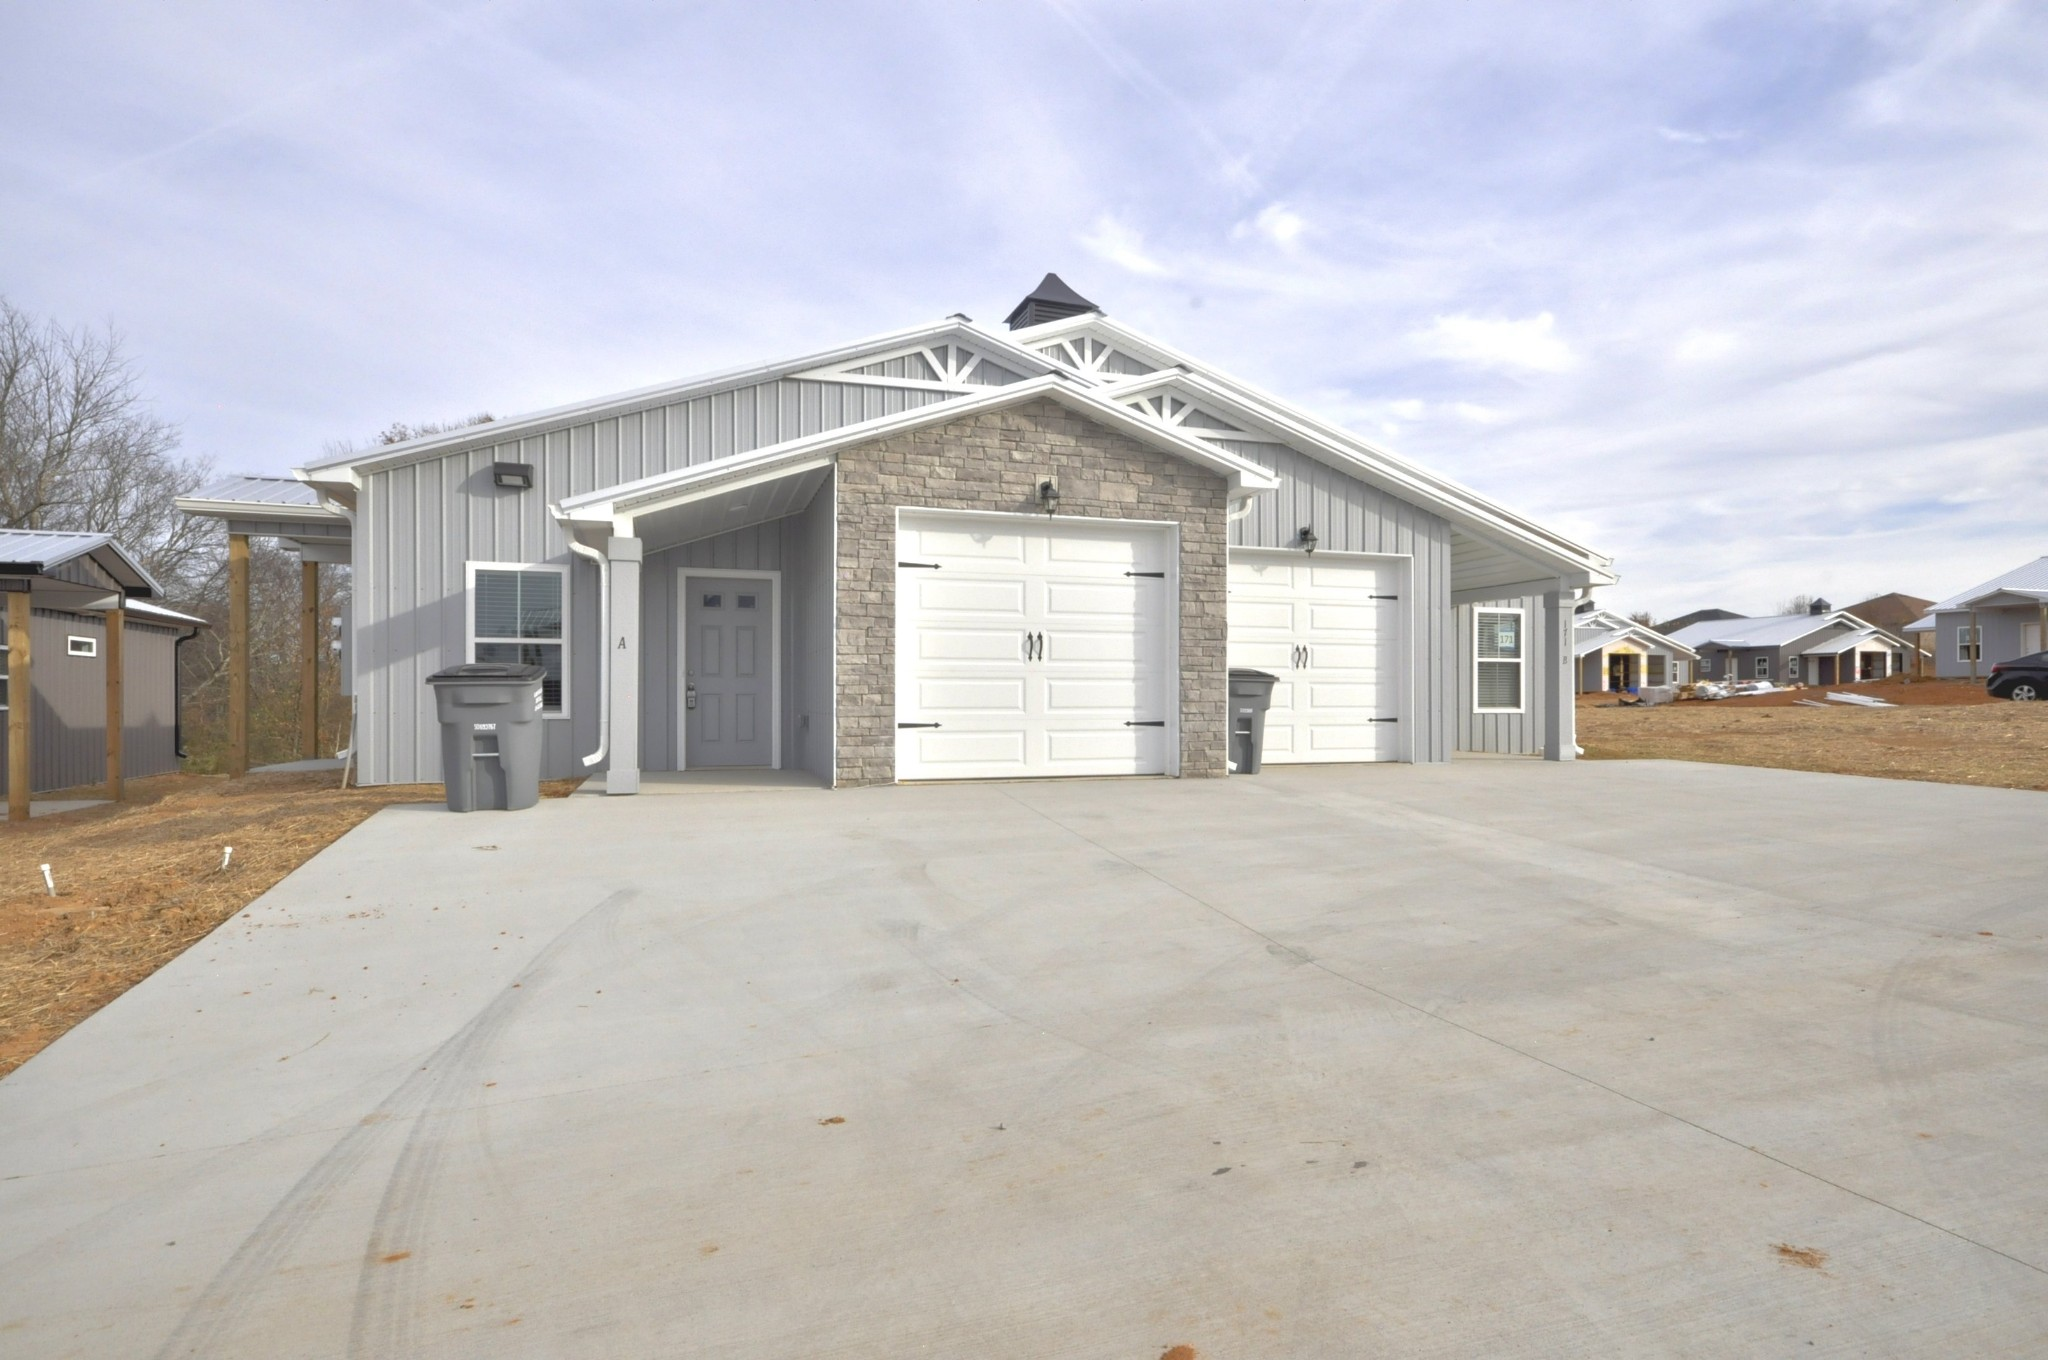 173 BAINBRIDGE DRIVE Unit A #A Property Photo - Clarksville, TN real estate listing